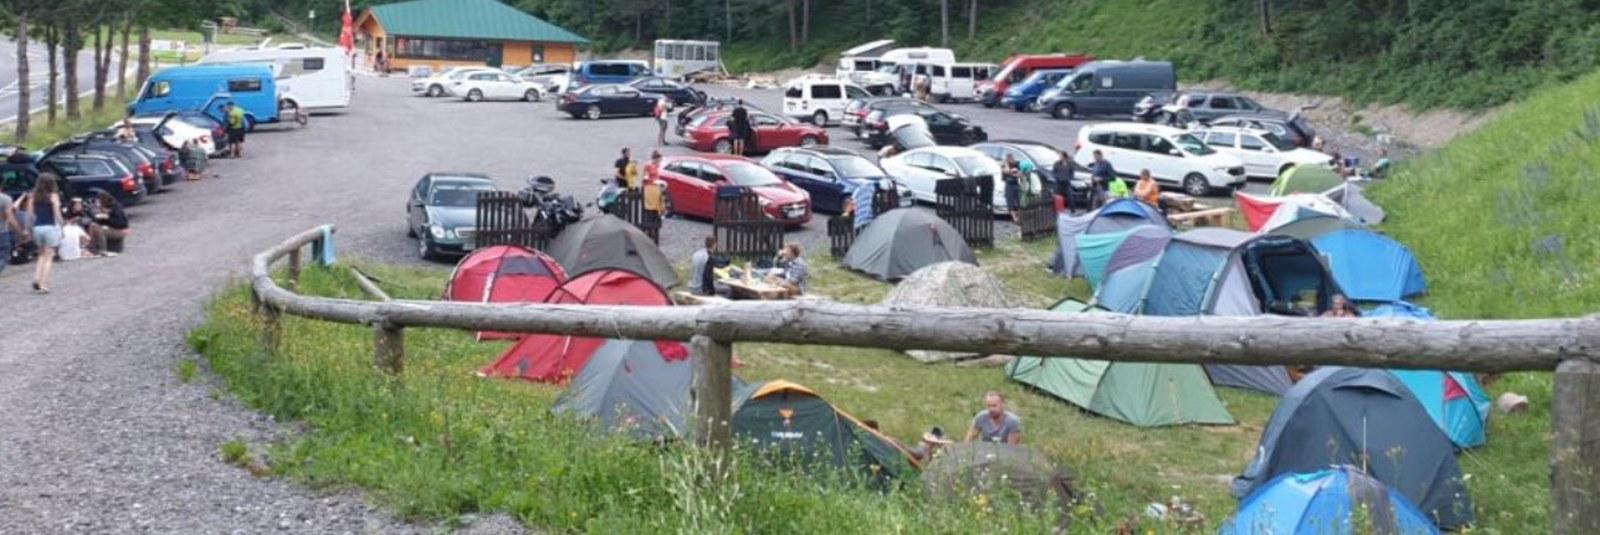 https://www.kempy-chaty.cz/sites/default/files/novinky/rax_park_camping_karavany_1600x535.jpg